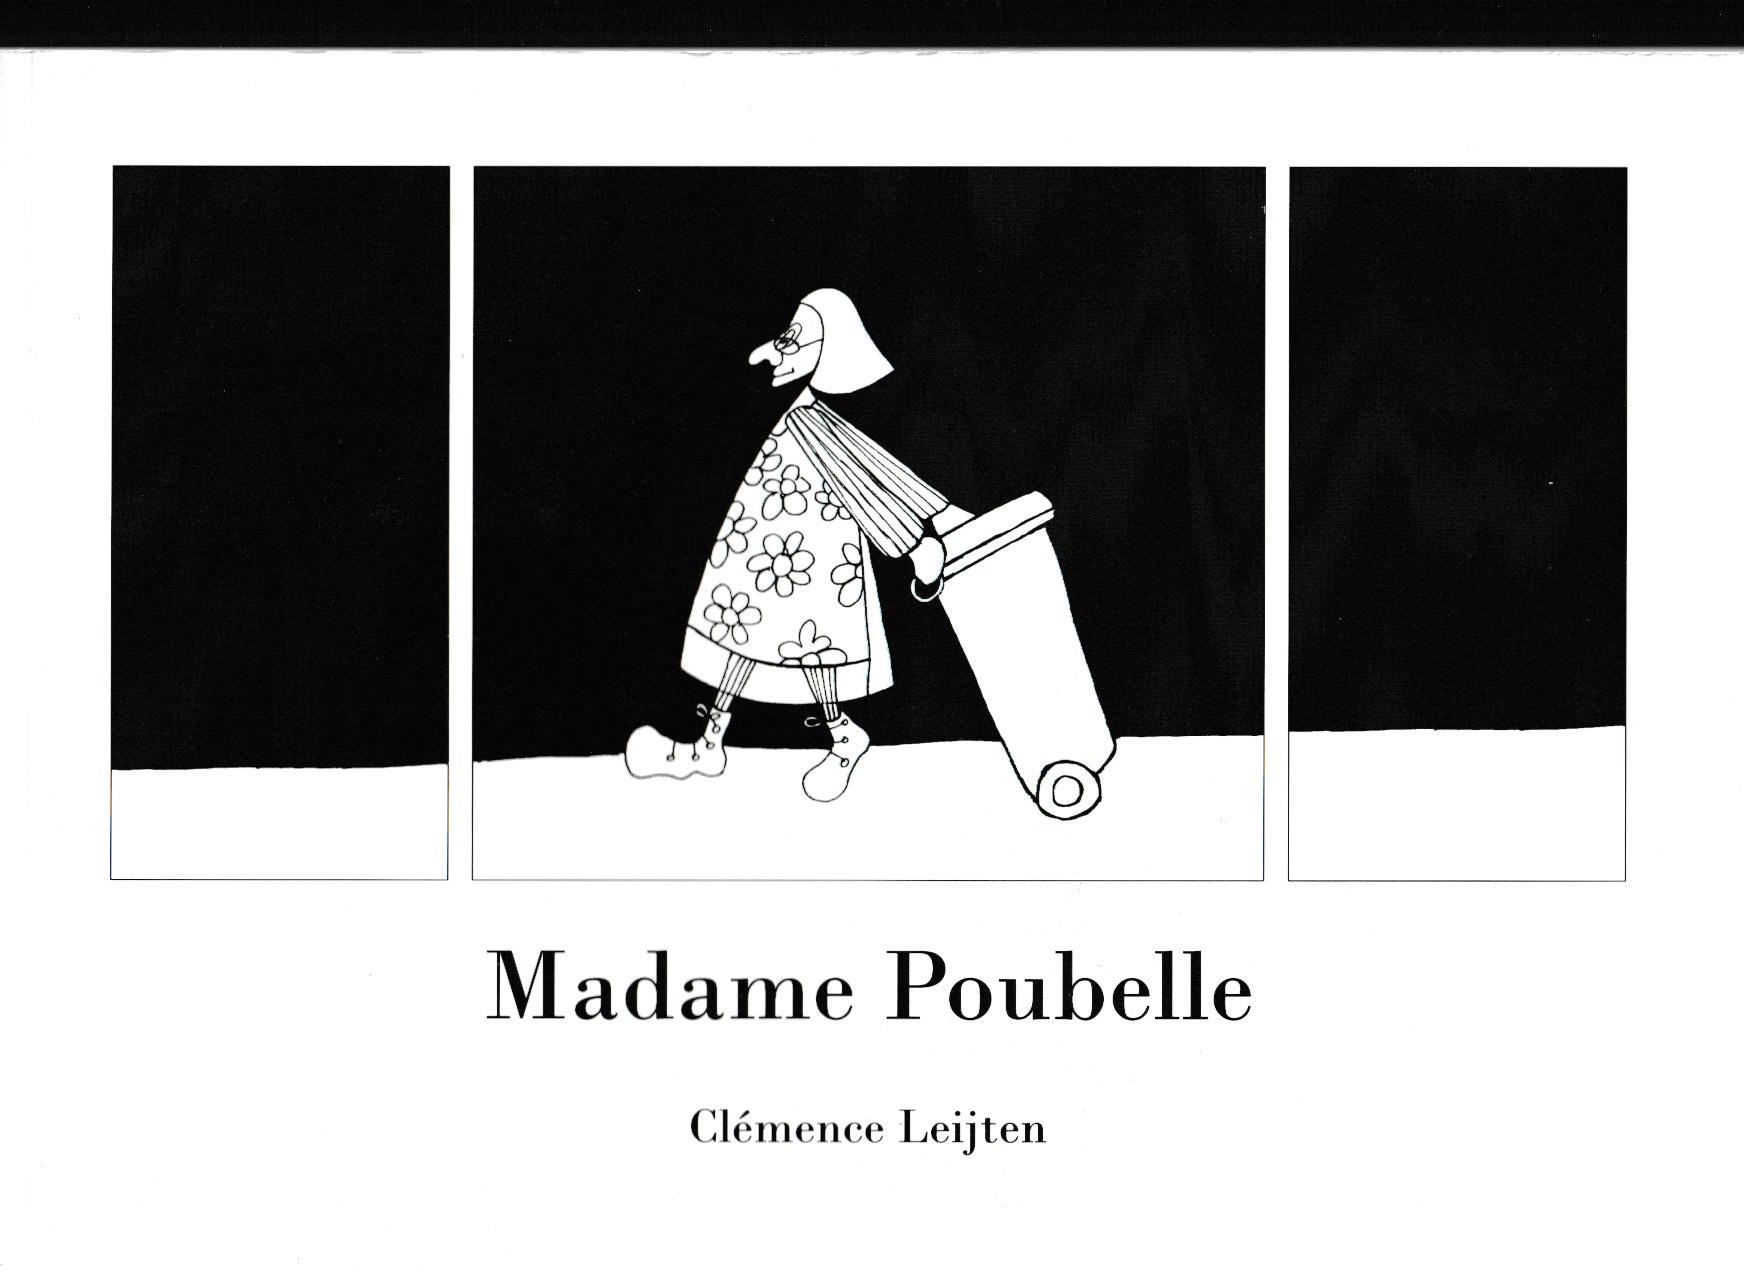 Madame Poubelle